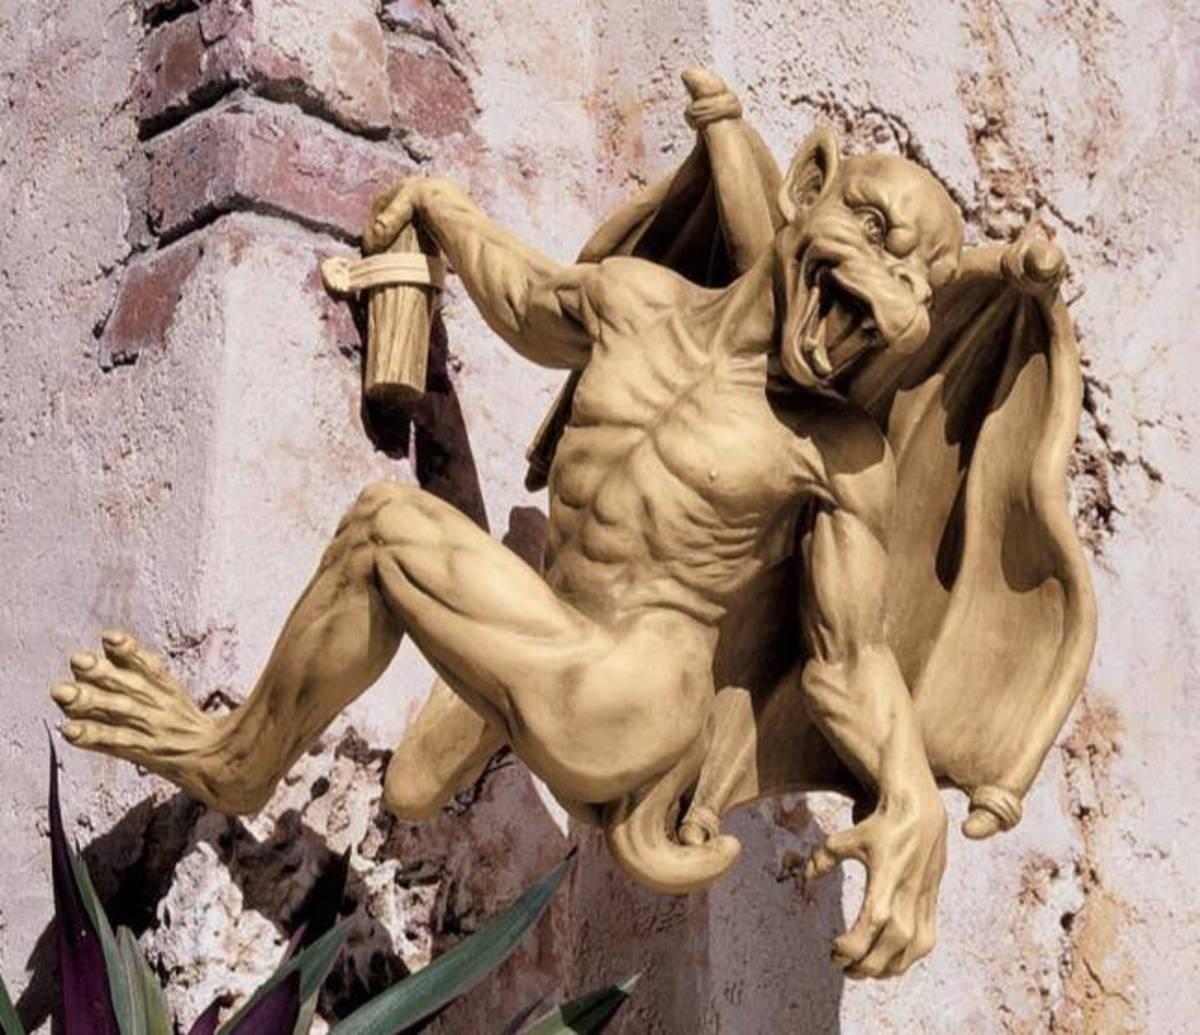 3-types-of-gargoyle-statues-for-your-garden